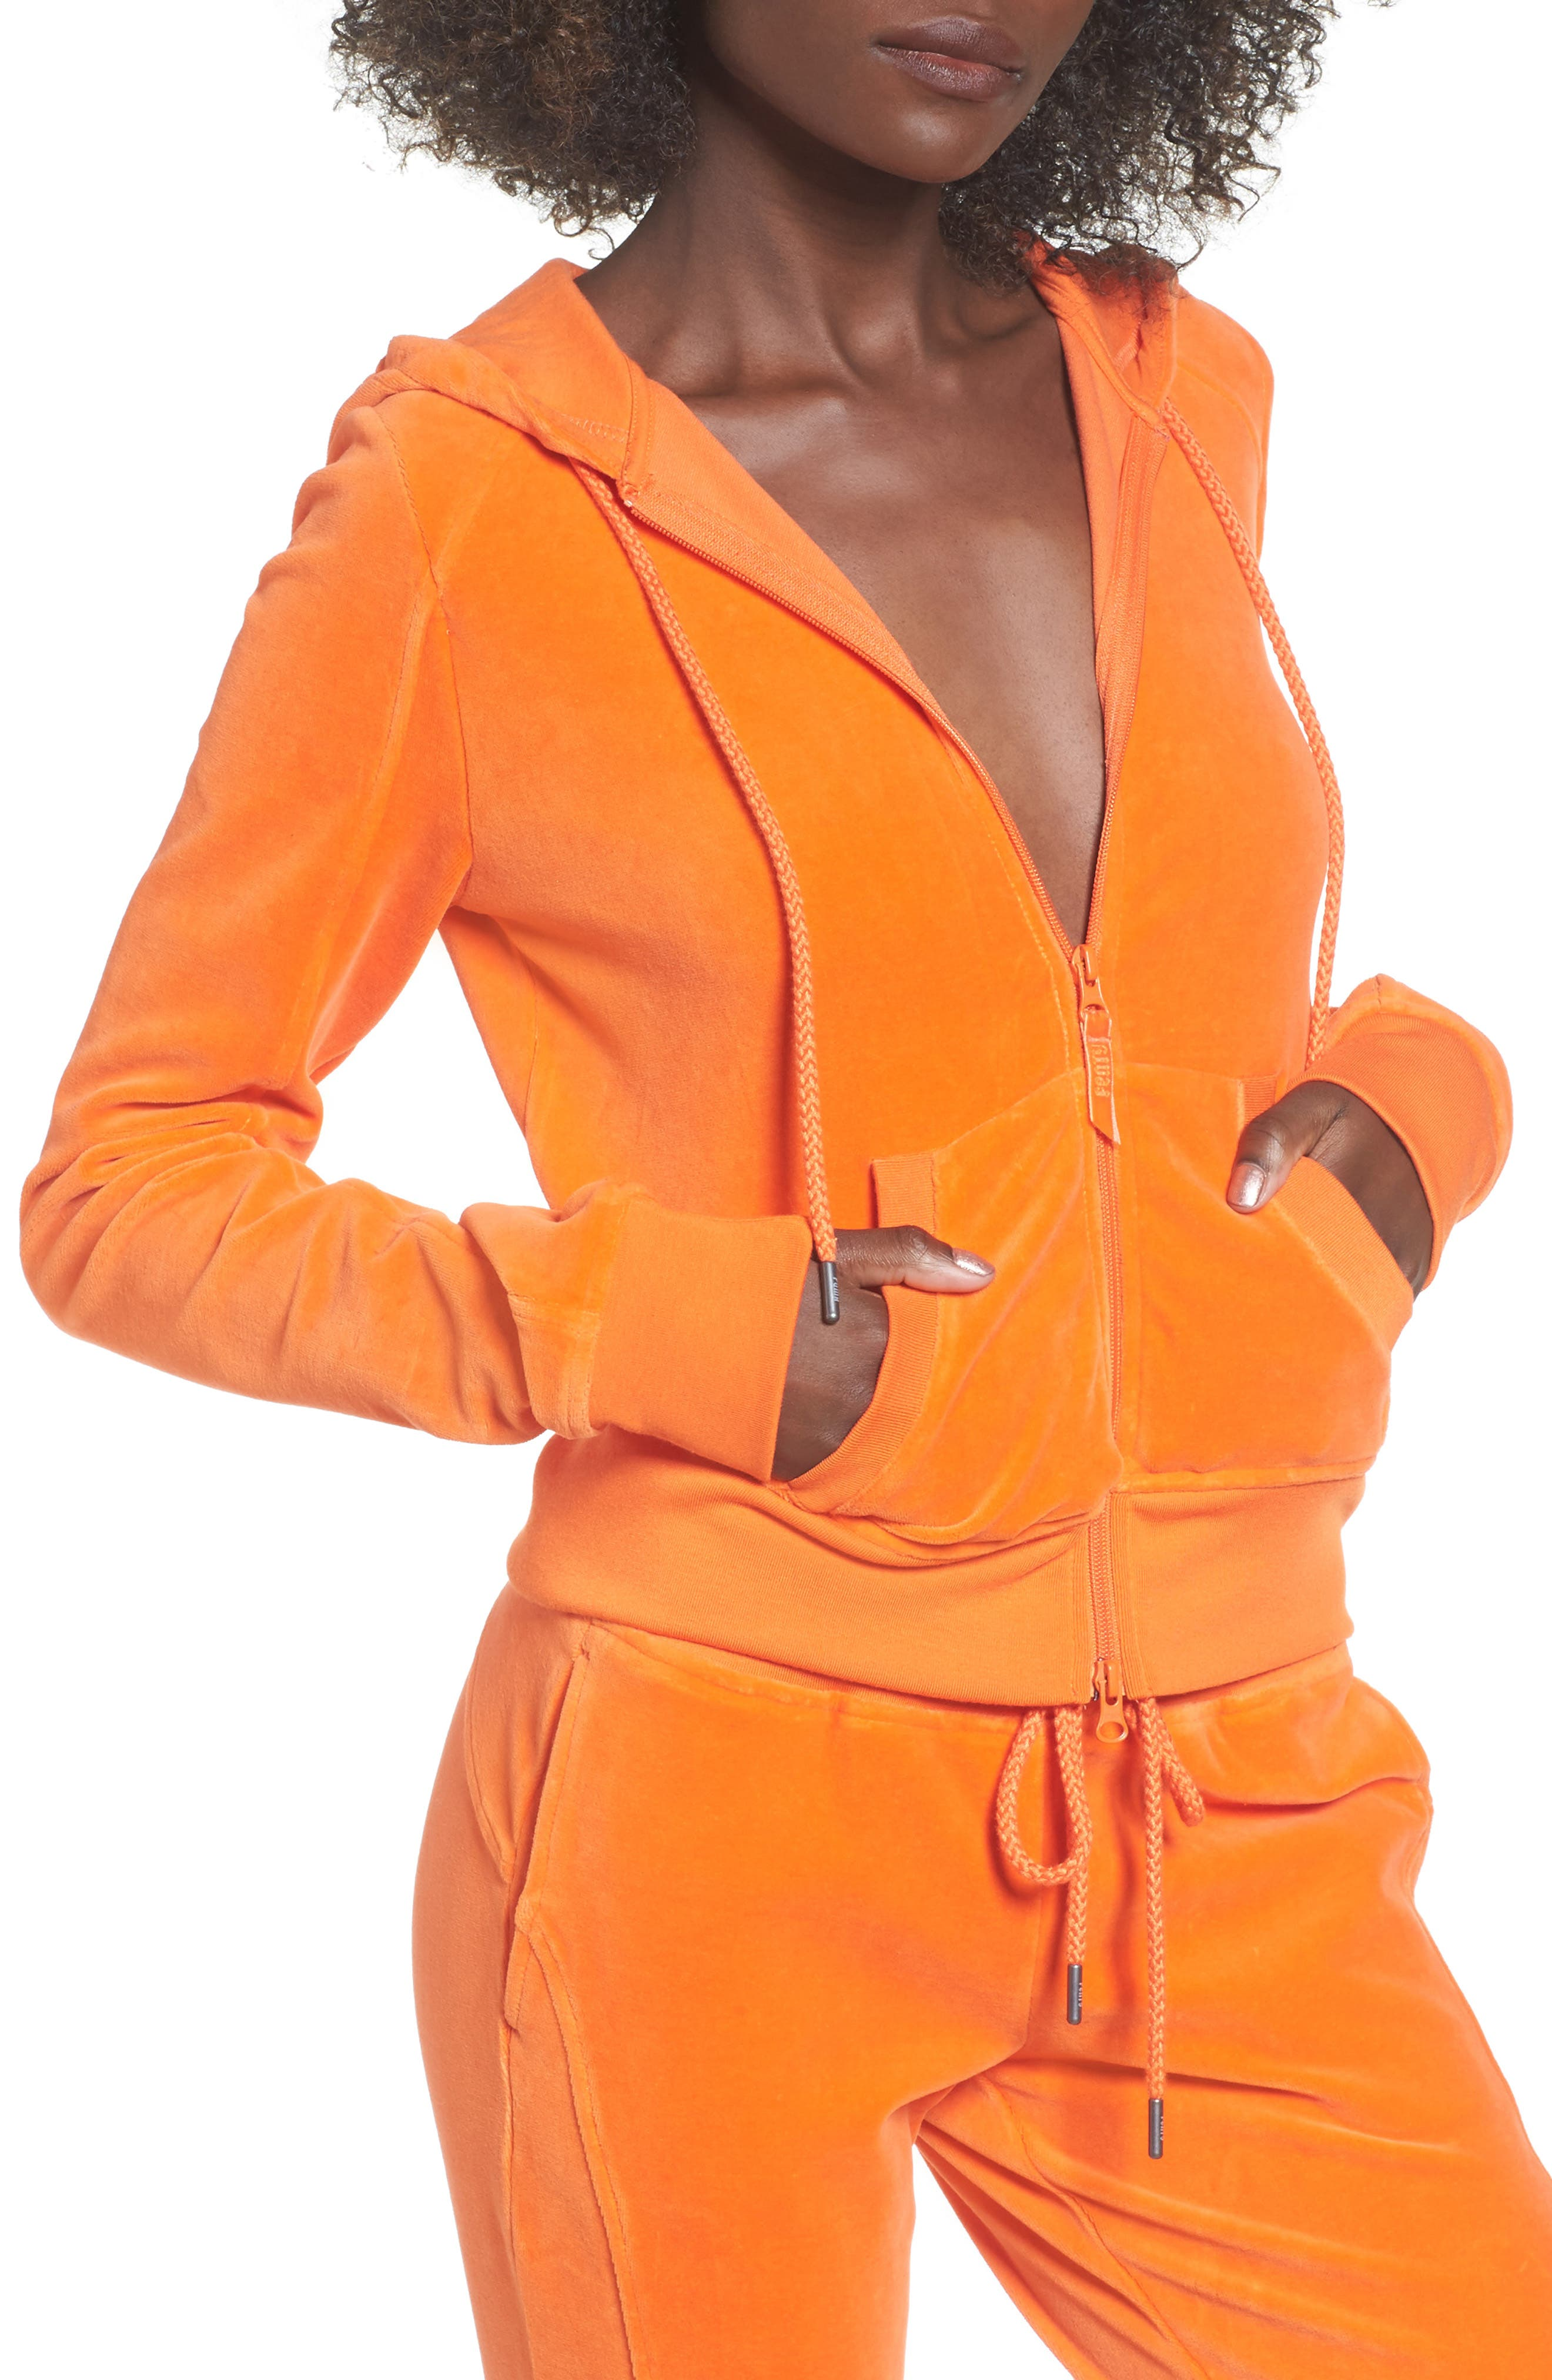 PUMA by Rihanna Velour Zip Hoodie,                         Main,                         color, Flame (Orange)